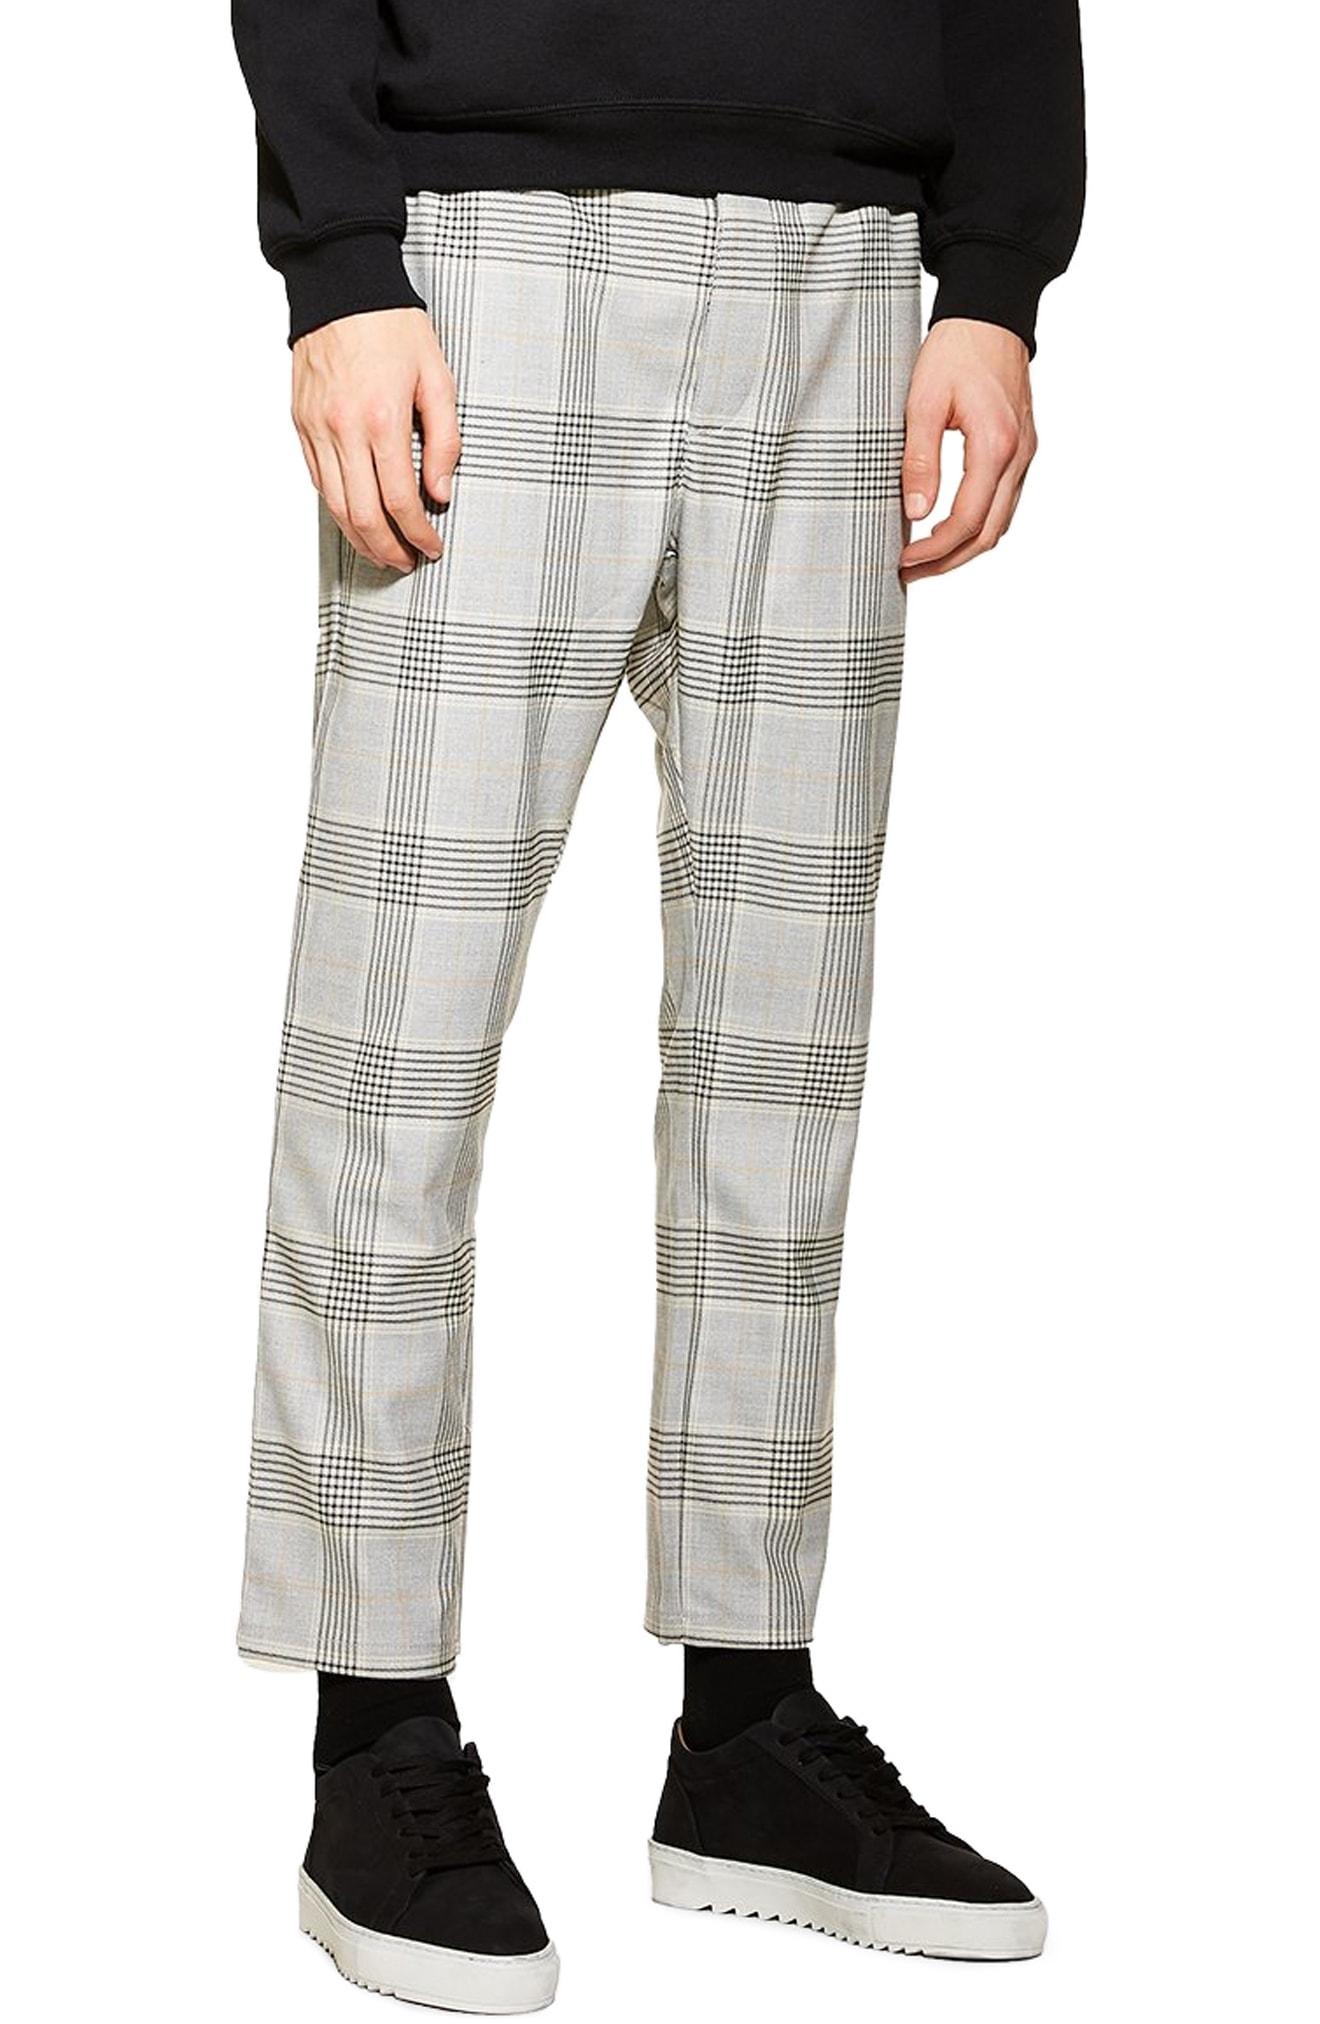 e06e0c587c7c Men's Topman Check Print Skinny Fit Trousers, Size 36 x 34 – Grey ...